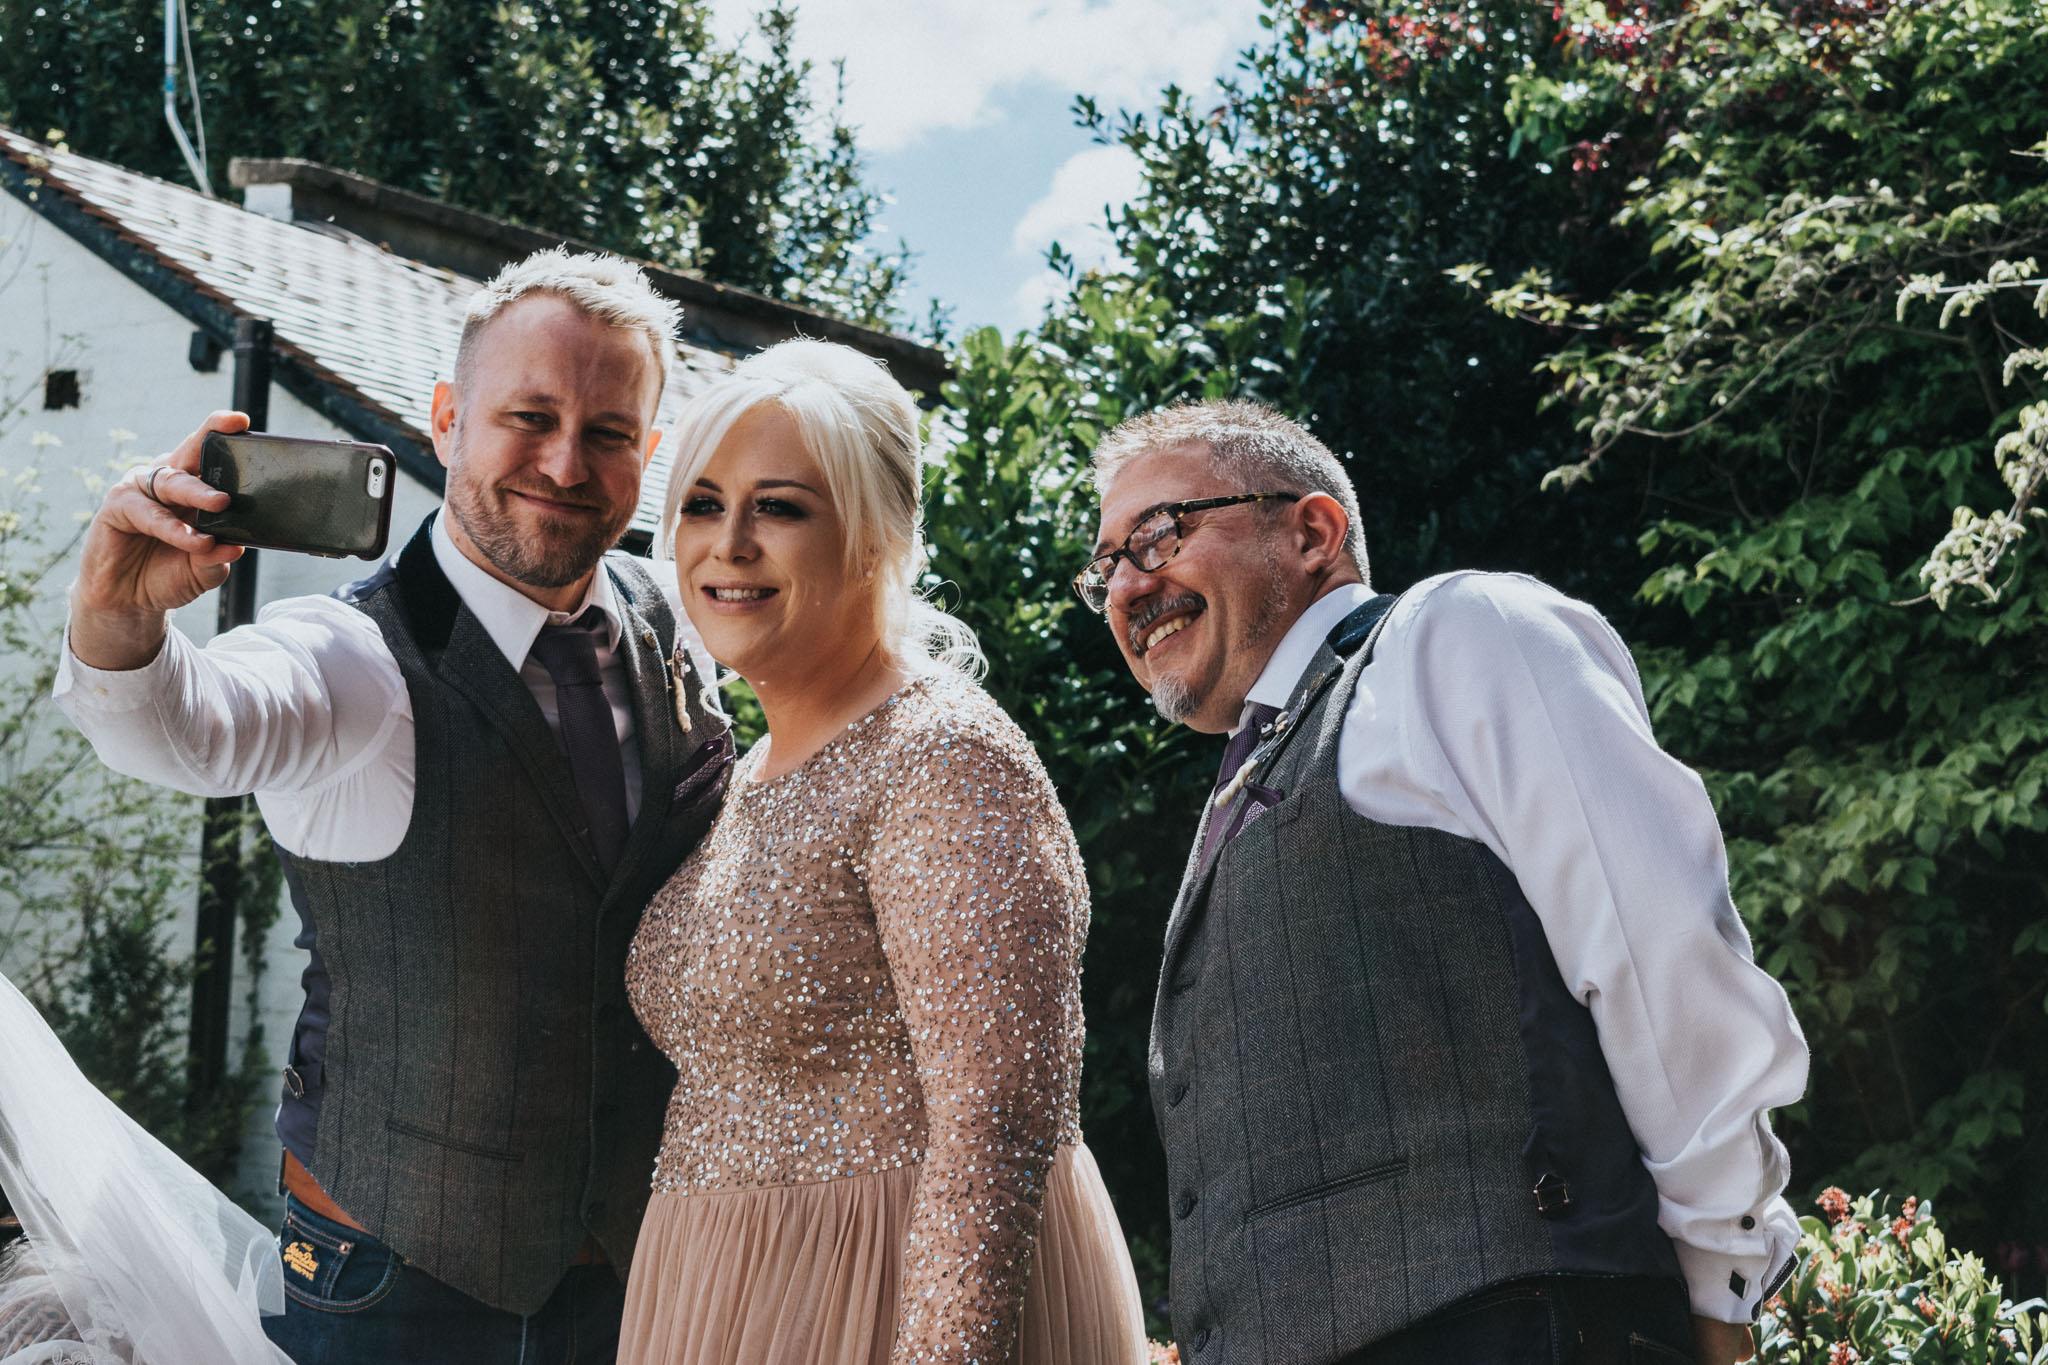 fun-wedding-photography-at-the-belle-epoque-knutsford-wedding-photographer (6).jpg